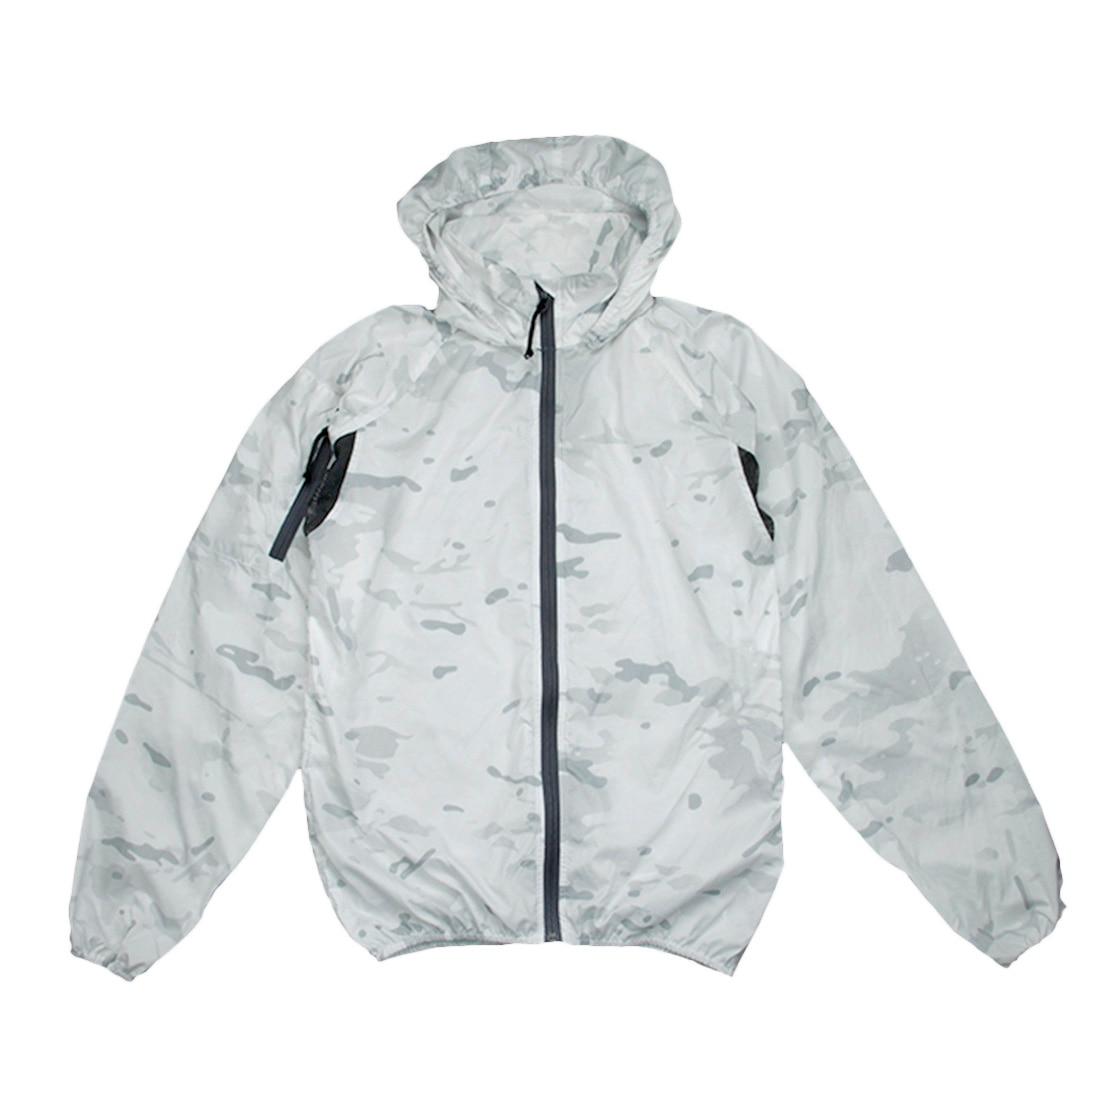 TMC Military Tactical Outwear Outdoor Jacket Windbreaker Liner Pocket Jacket Multicam Alpine  High Quality  - MP - S L XL